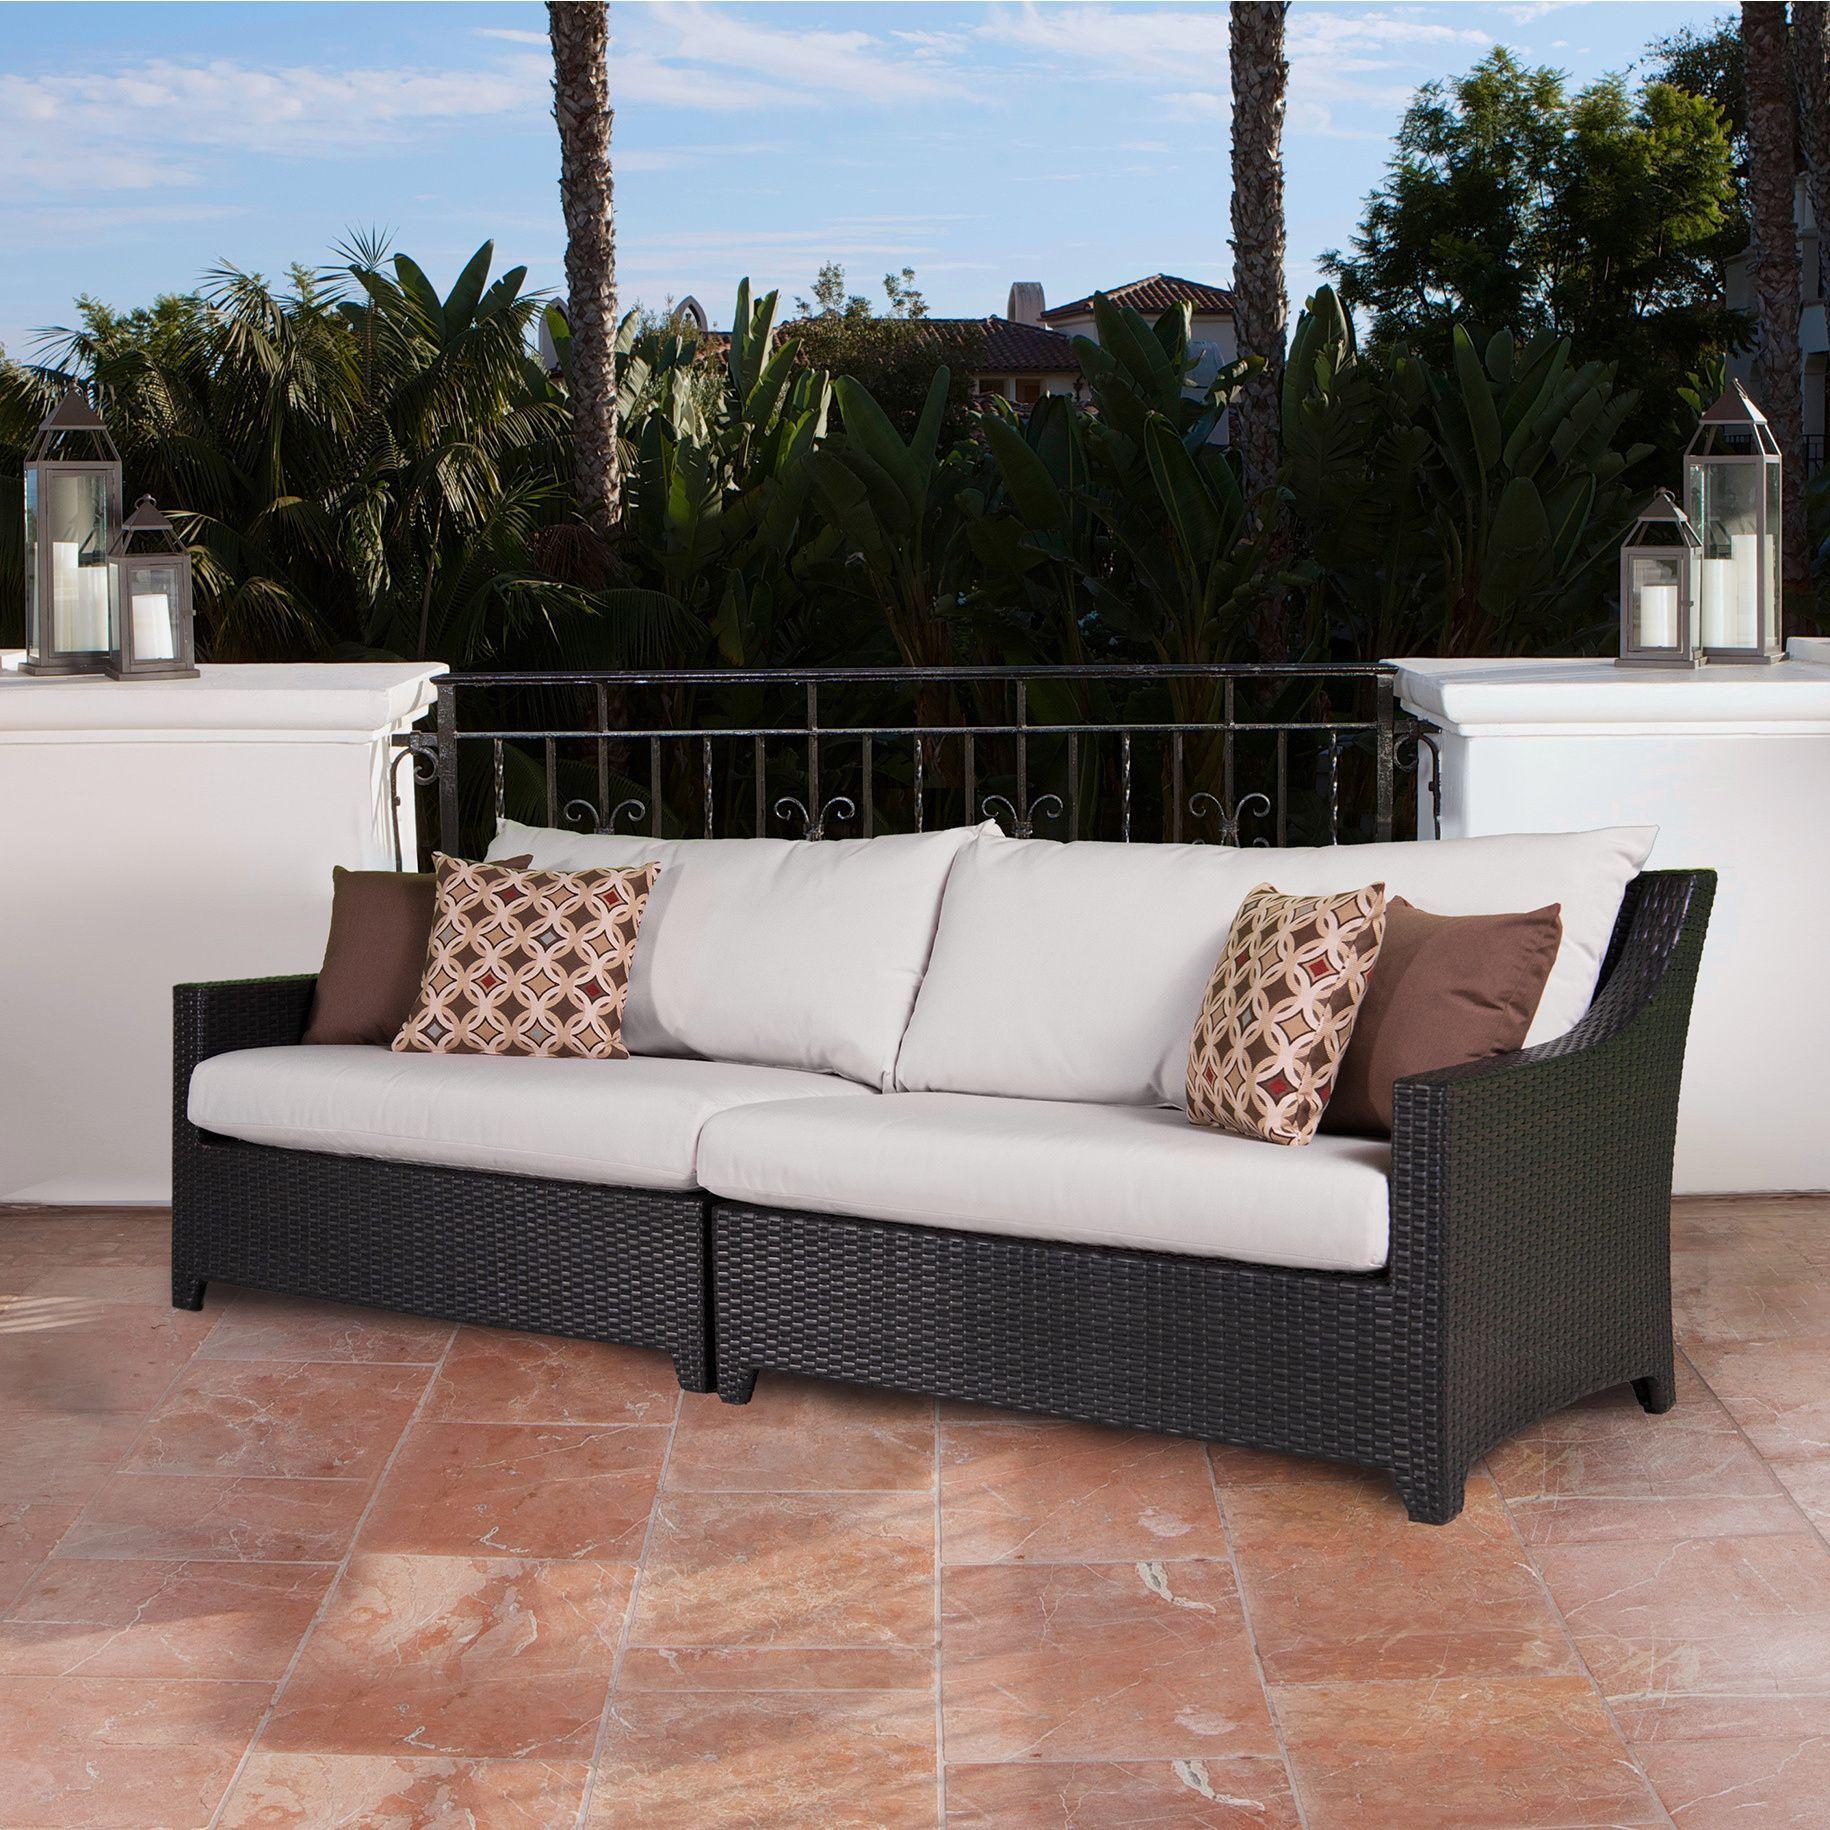 moroccan garden furniture. RST Brands Deco 2-piece Sofa With Moroccan Cream Cushions (Moroccan Cream), Garden Furniture E